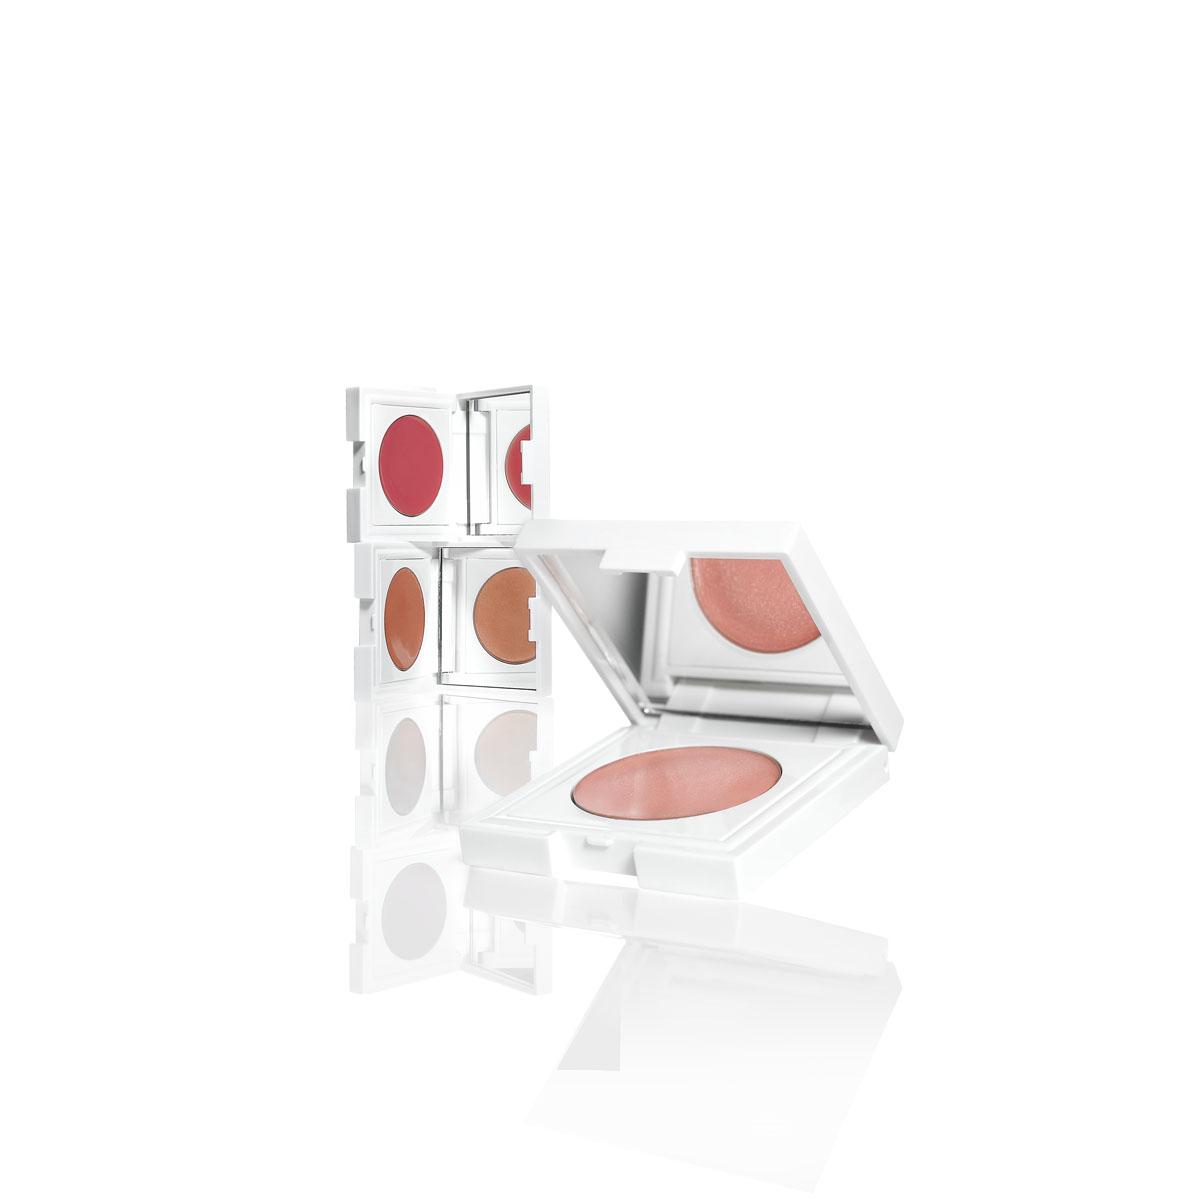 NP Set Lip Gloss Compact ($12).